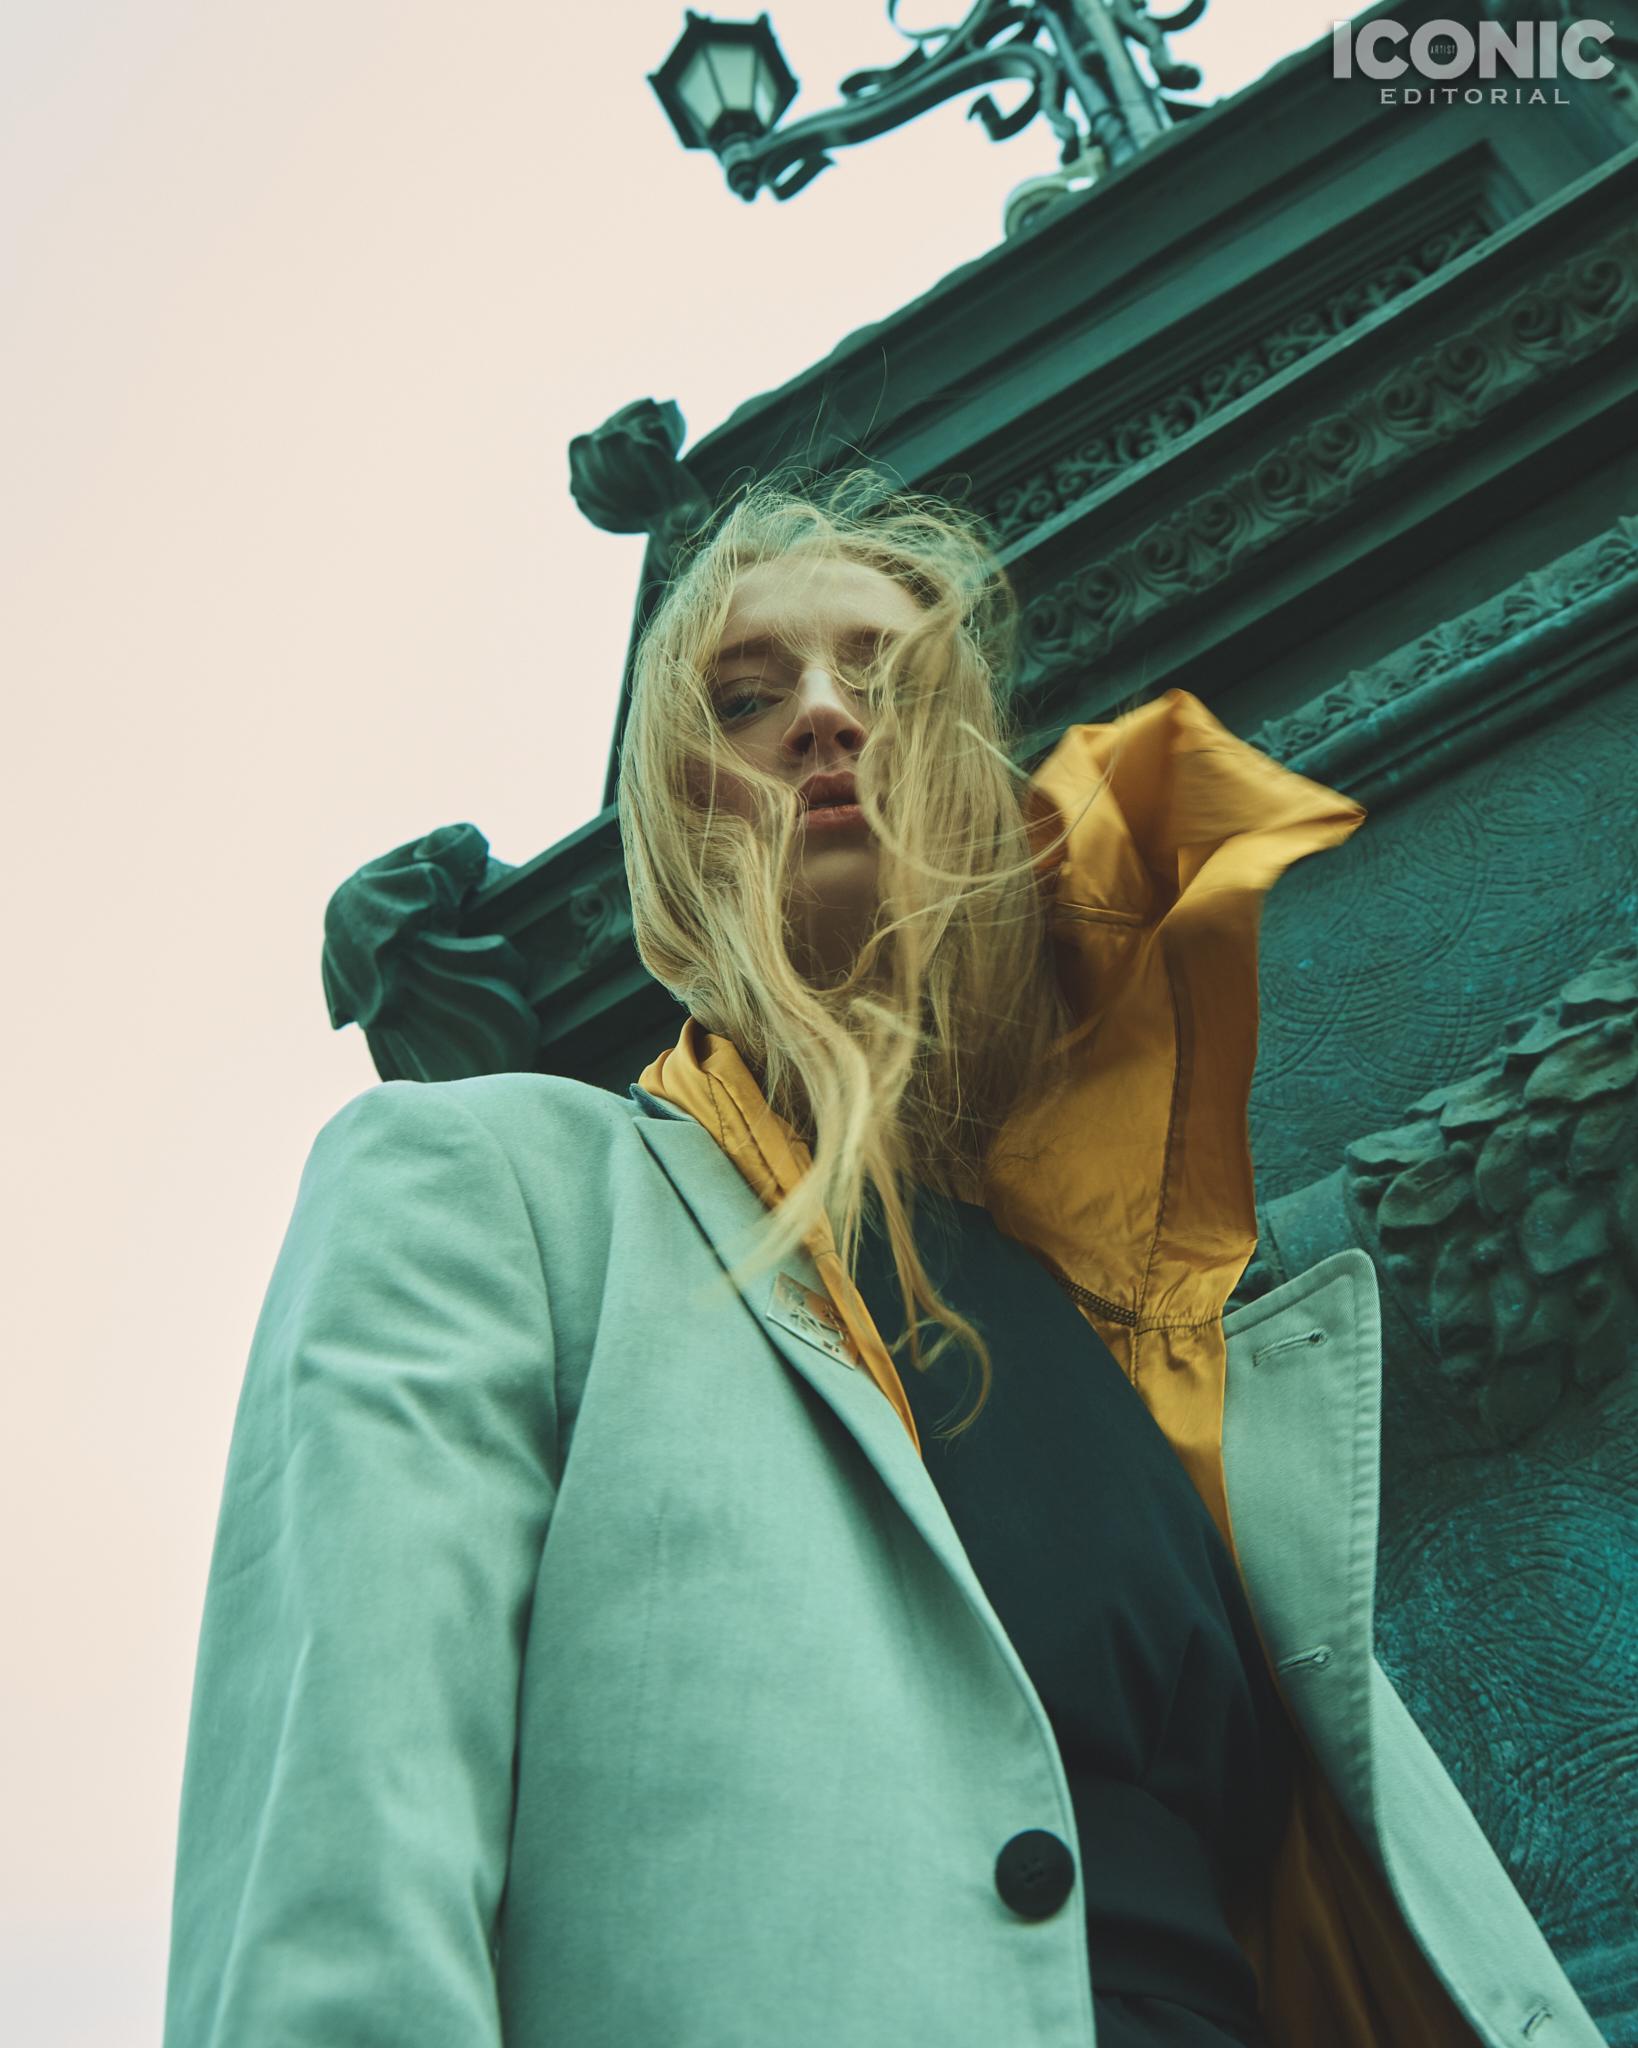 13/15  Jacket |  @artemshumov  Sweater |  @pingpongclubmoscow  Cape |  @crimescene_official  Dress |  @lenamaksimova.brand   © Alej Fernández